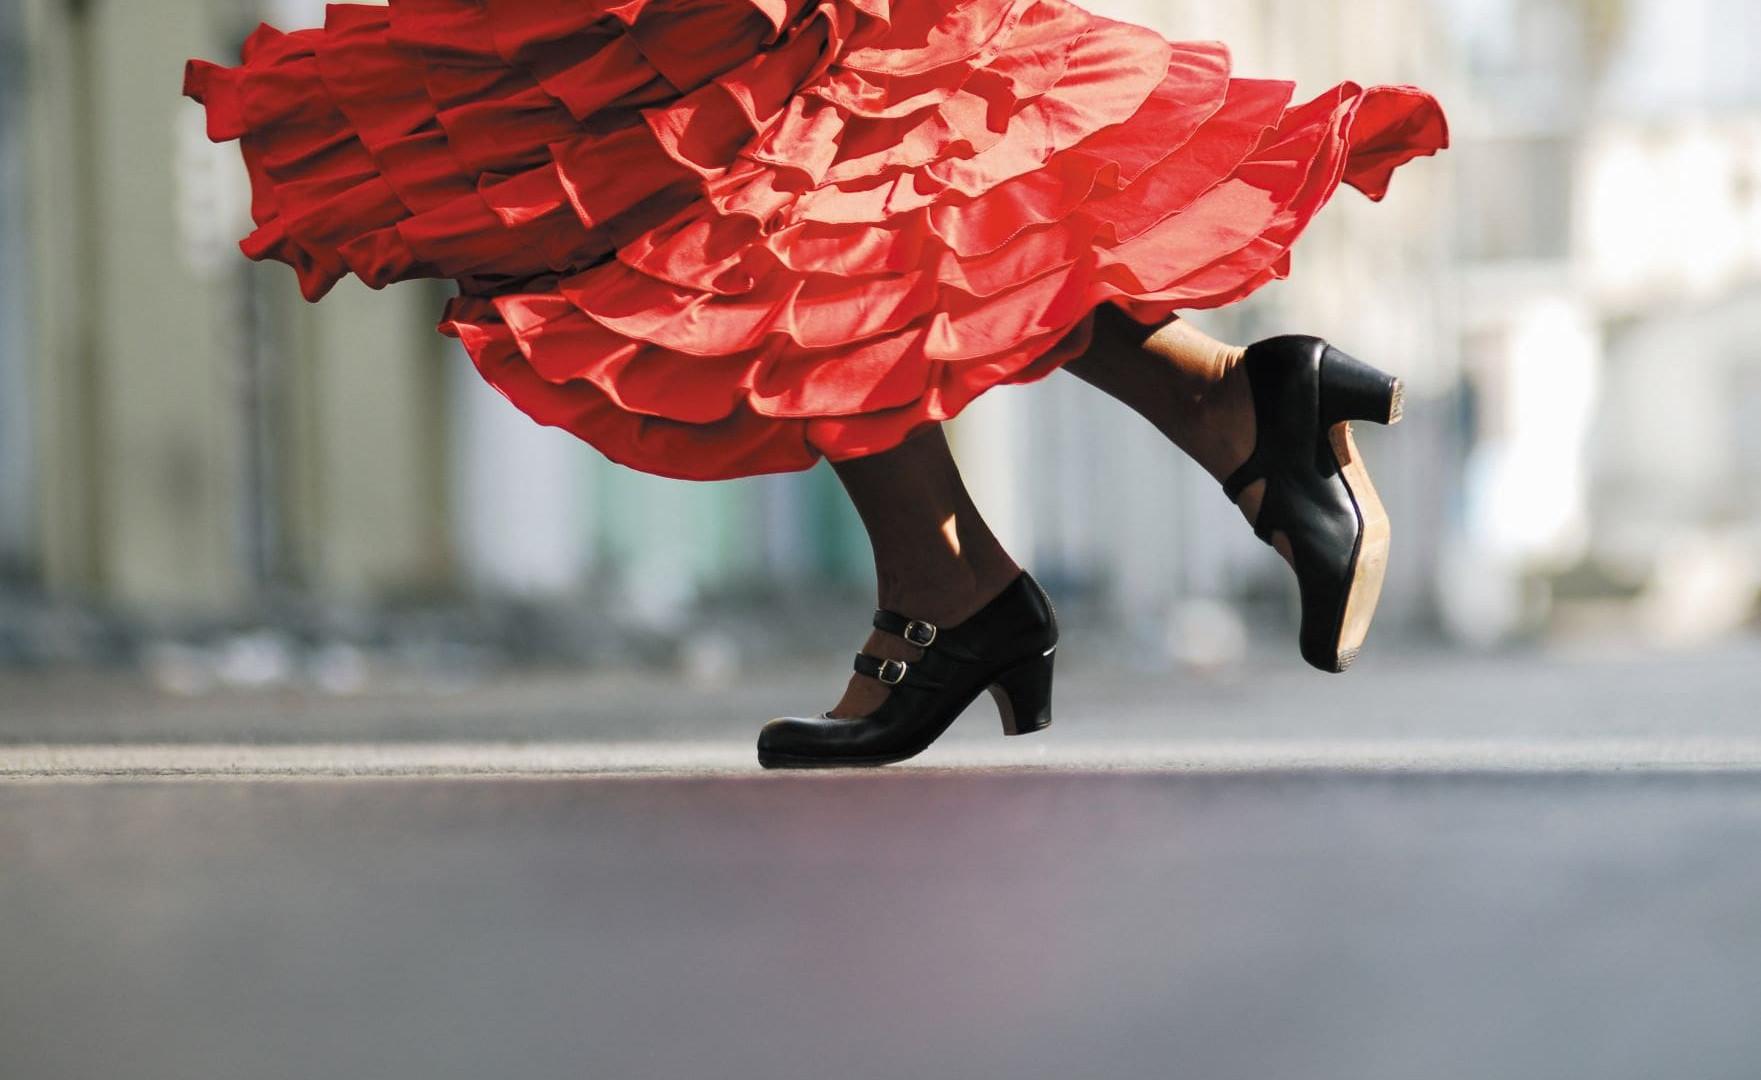 Barcelona - Flamenco Dancer